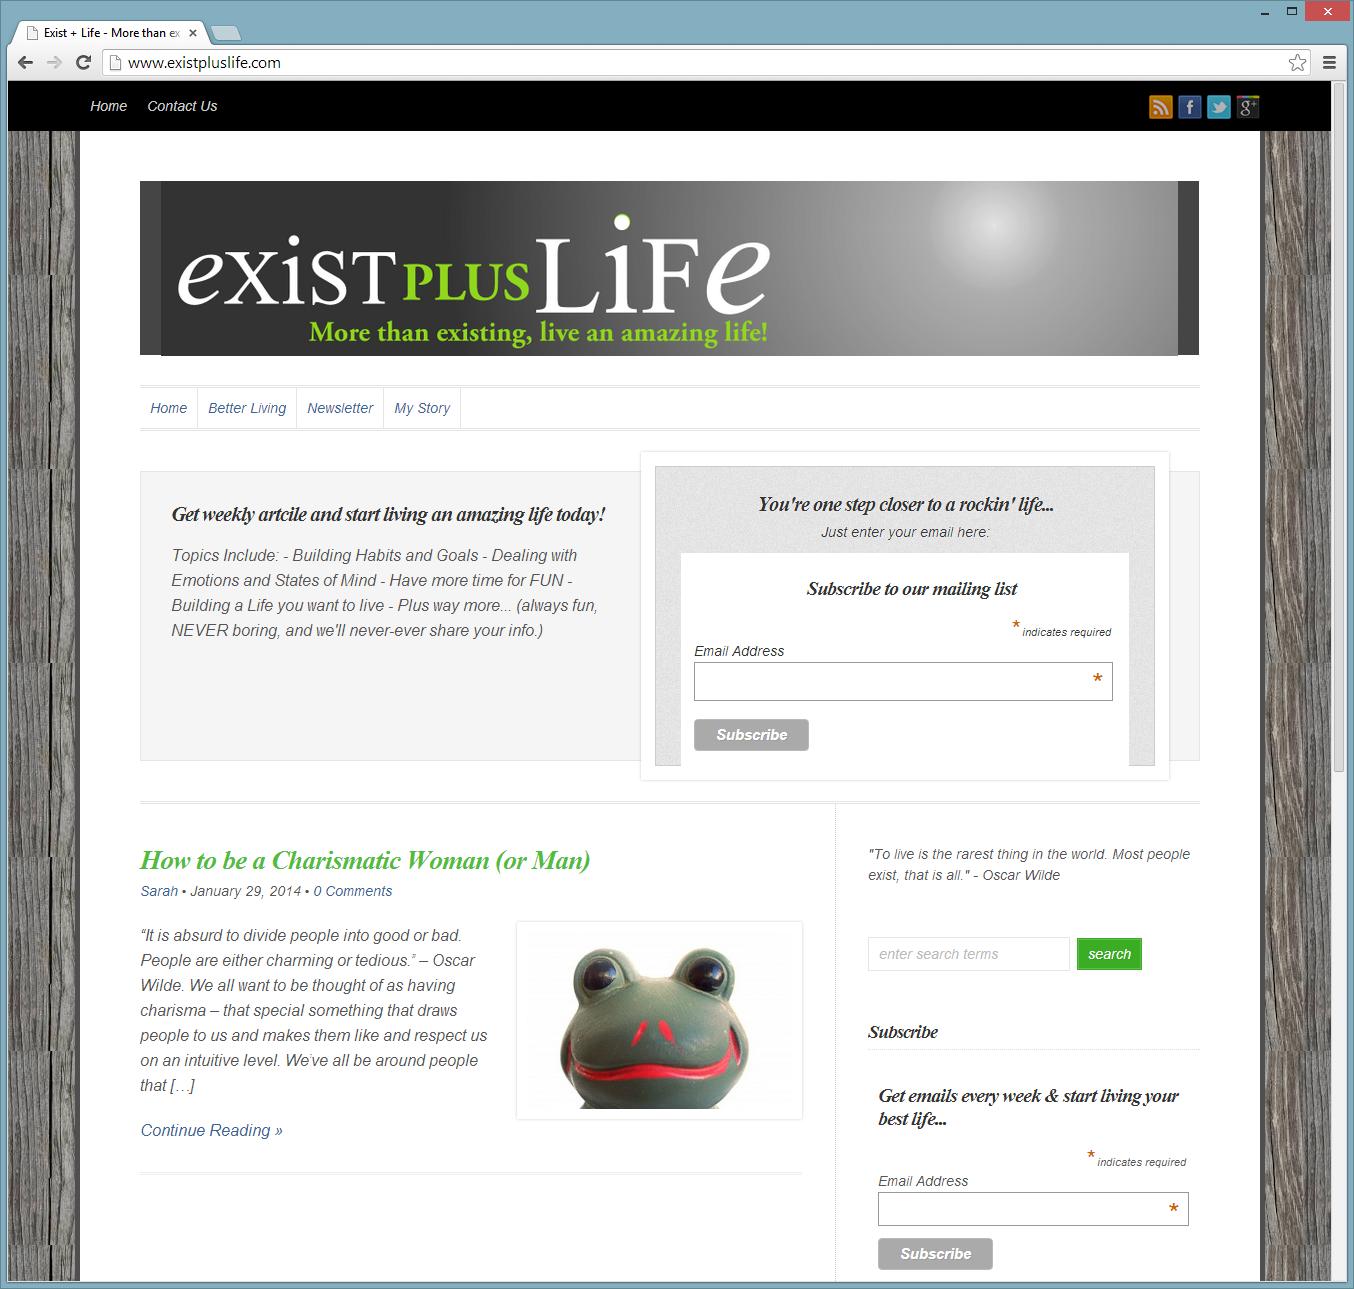 ExistPlusLife